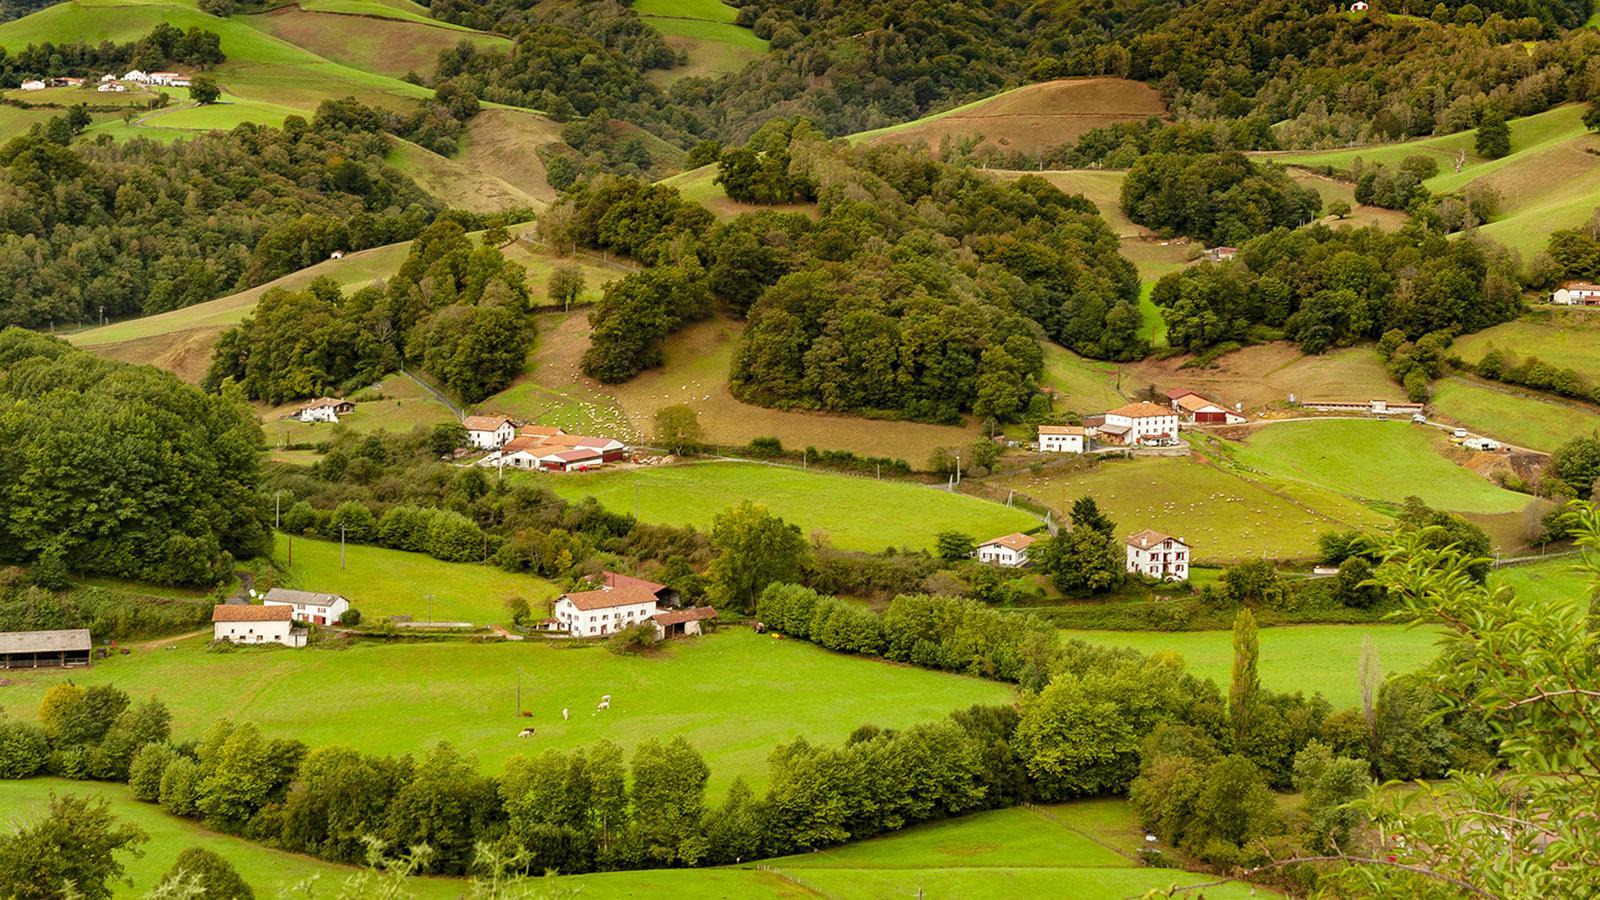 Kintoa-Heimat: das Vallée des Aldudes im Baskenland. Foto: Hilke Maunder